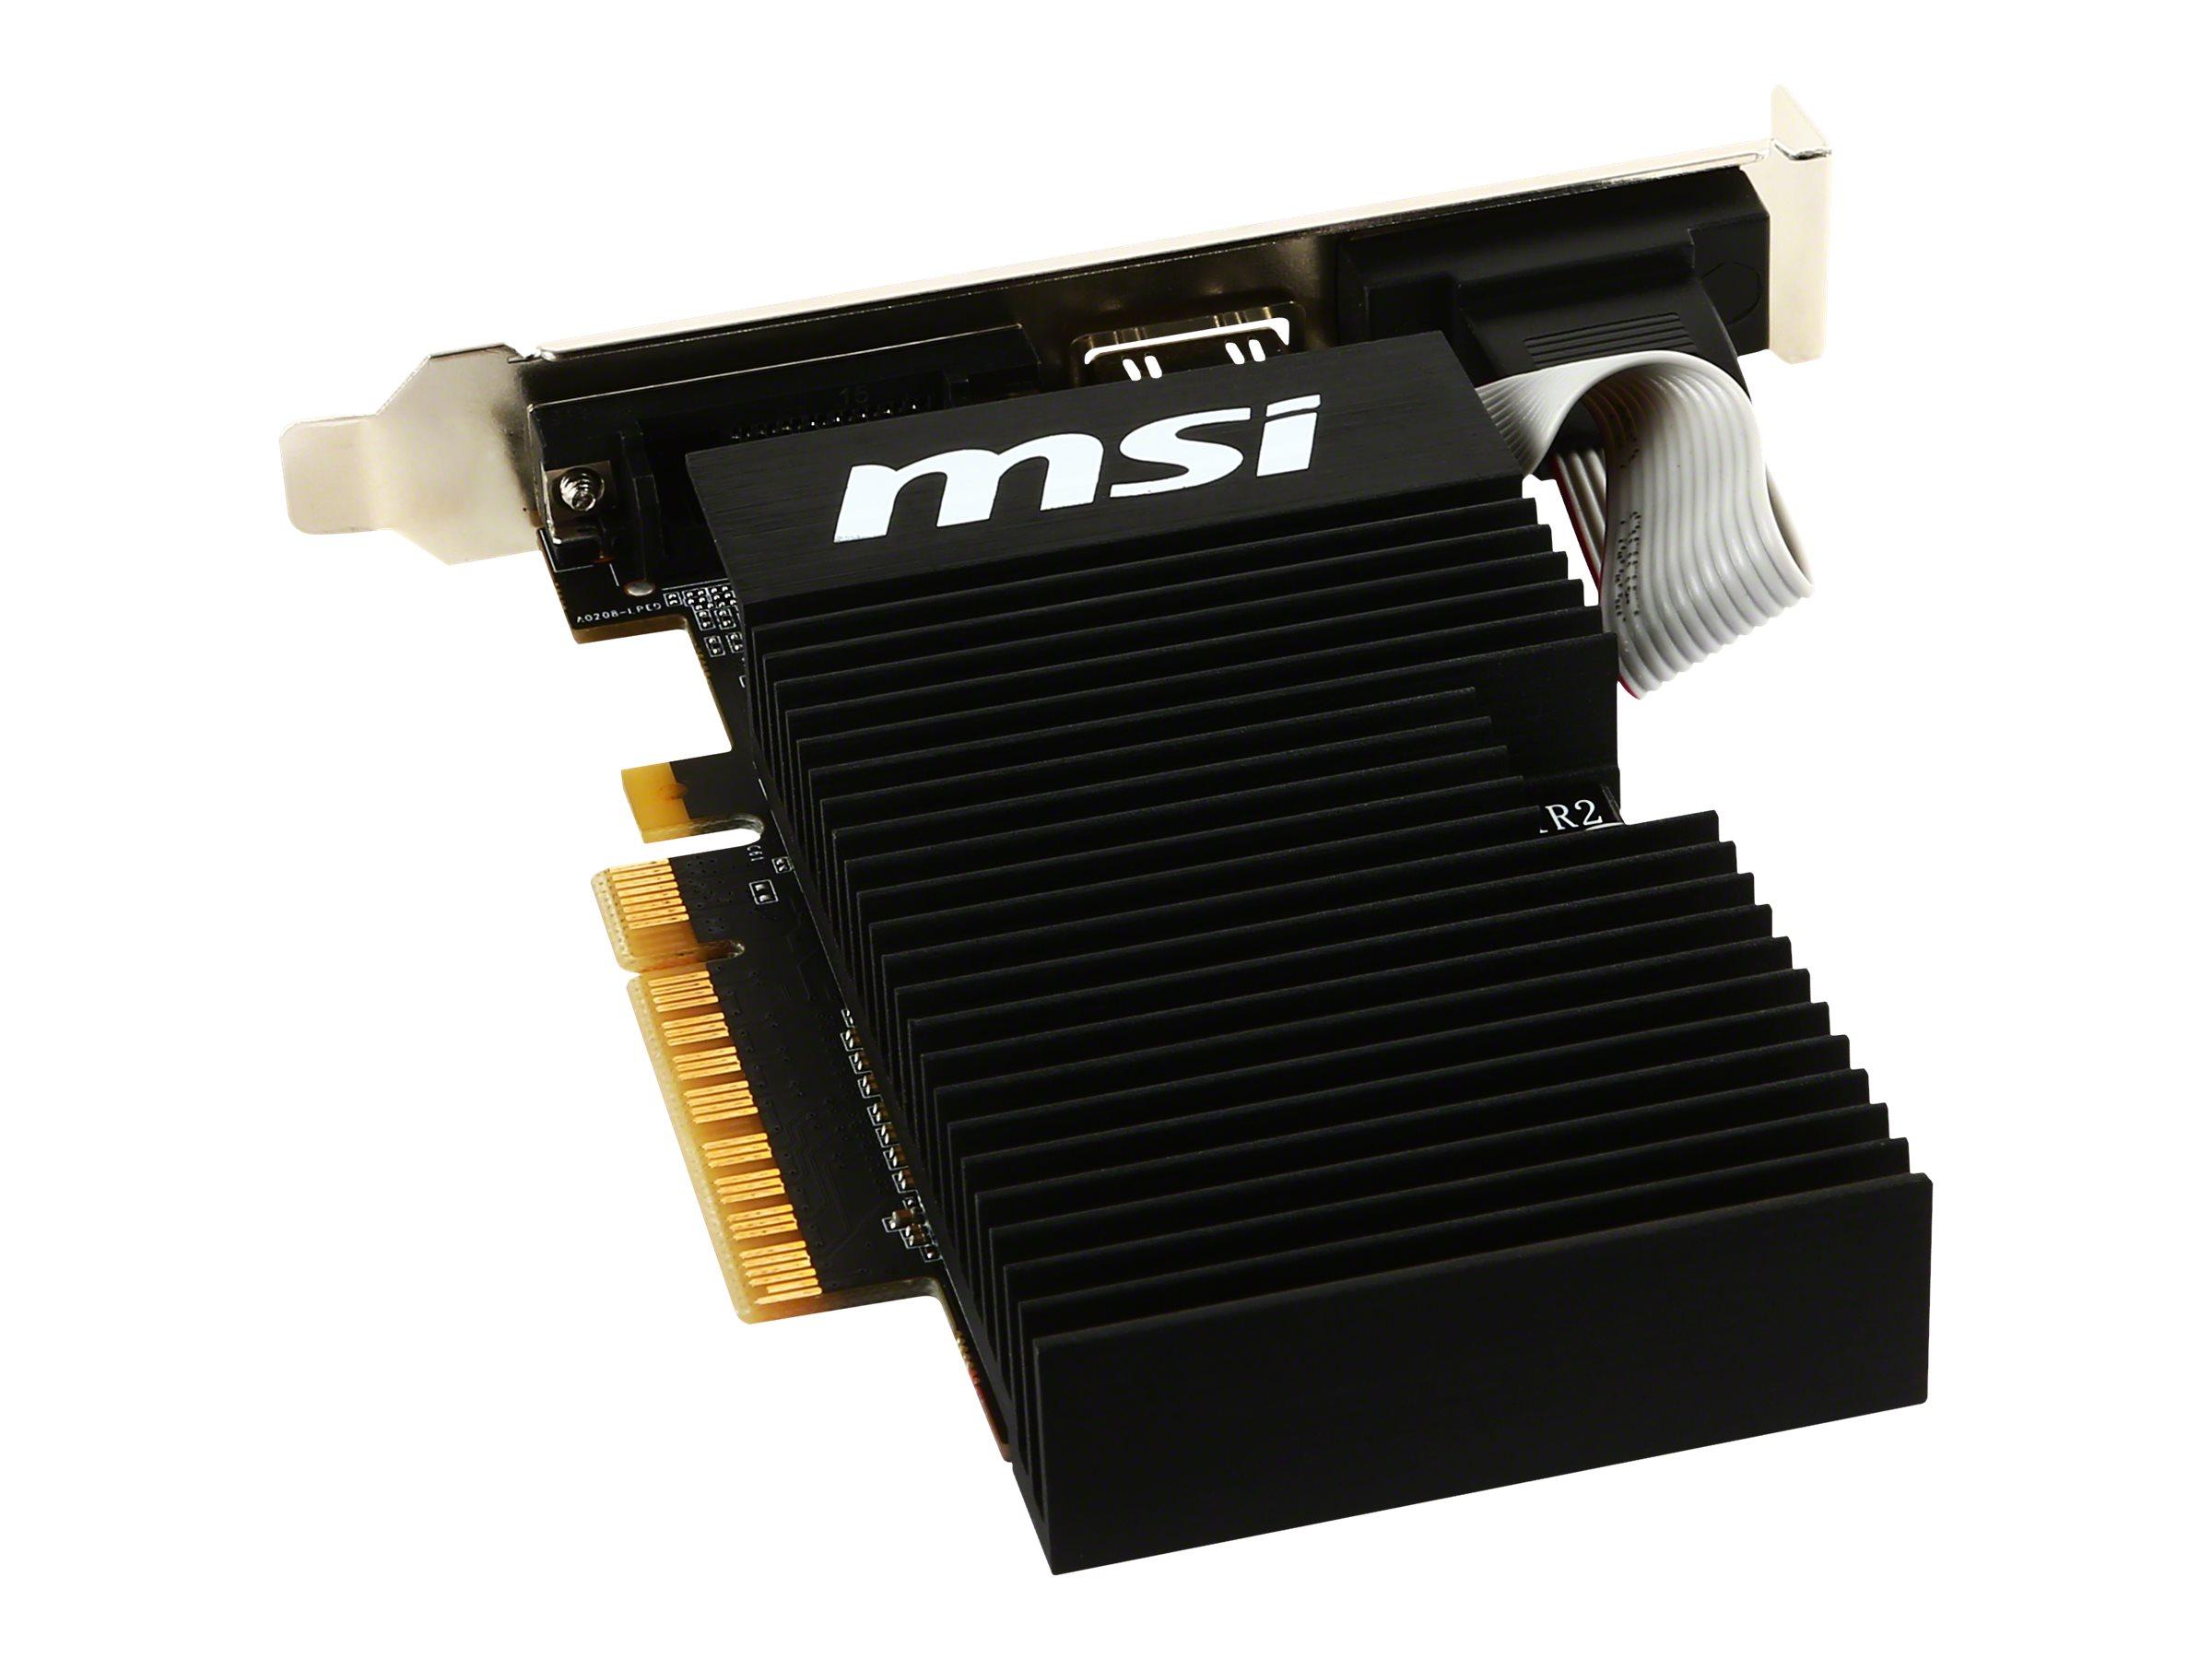 MSI GT 710 1GD3H LPV1 - graphics card - GF GT 710 - 1 GB